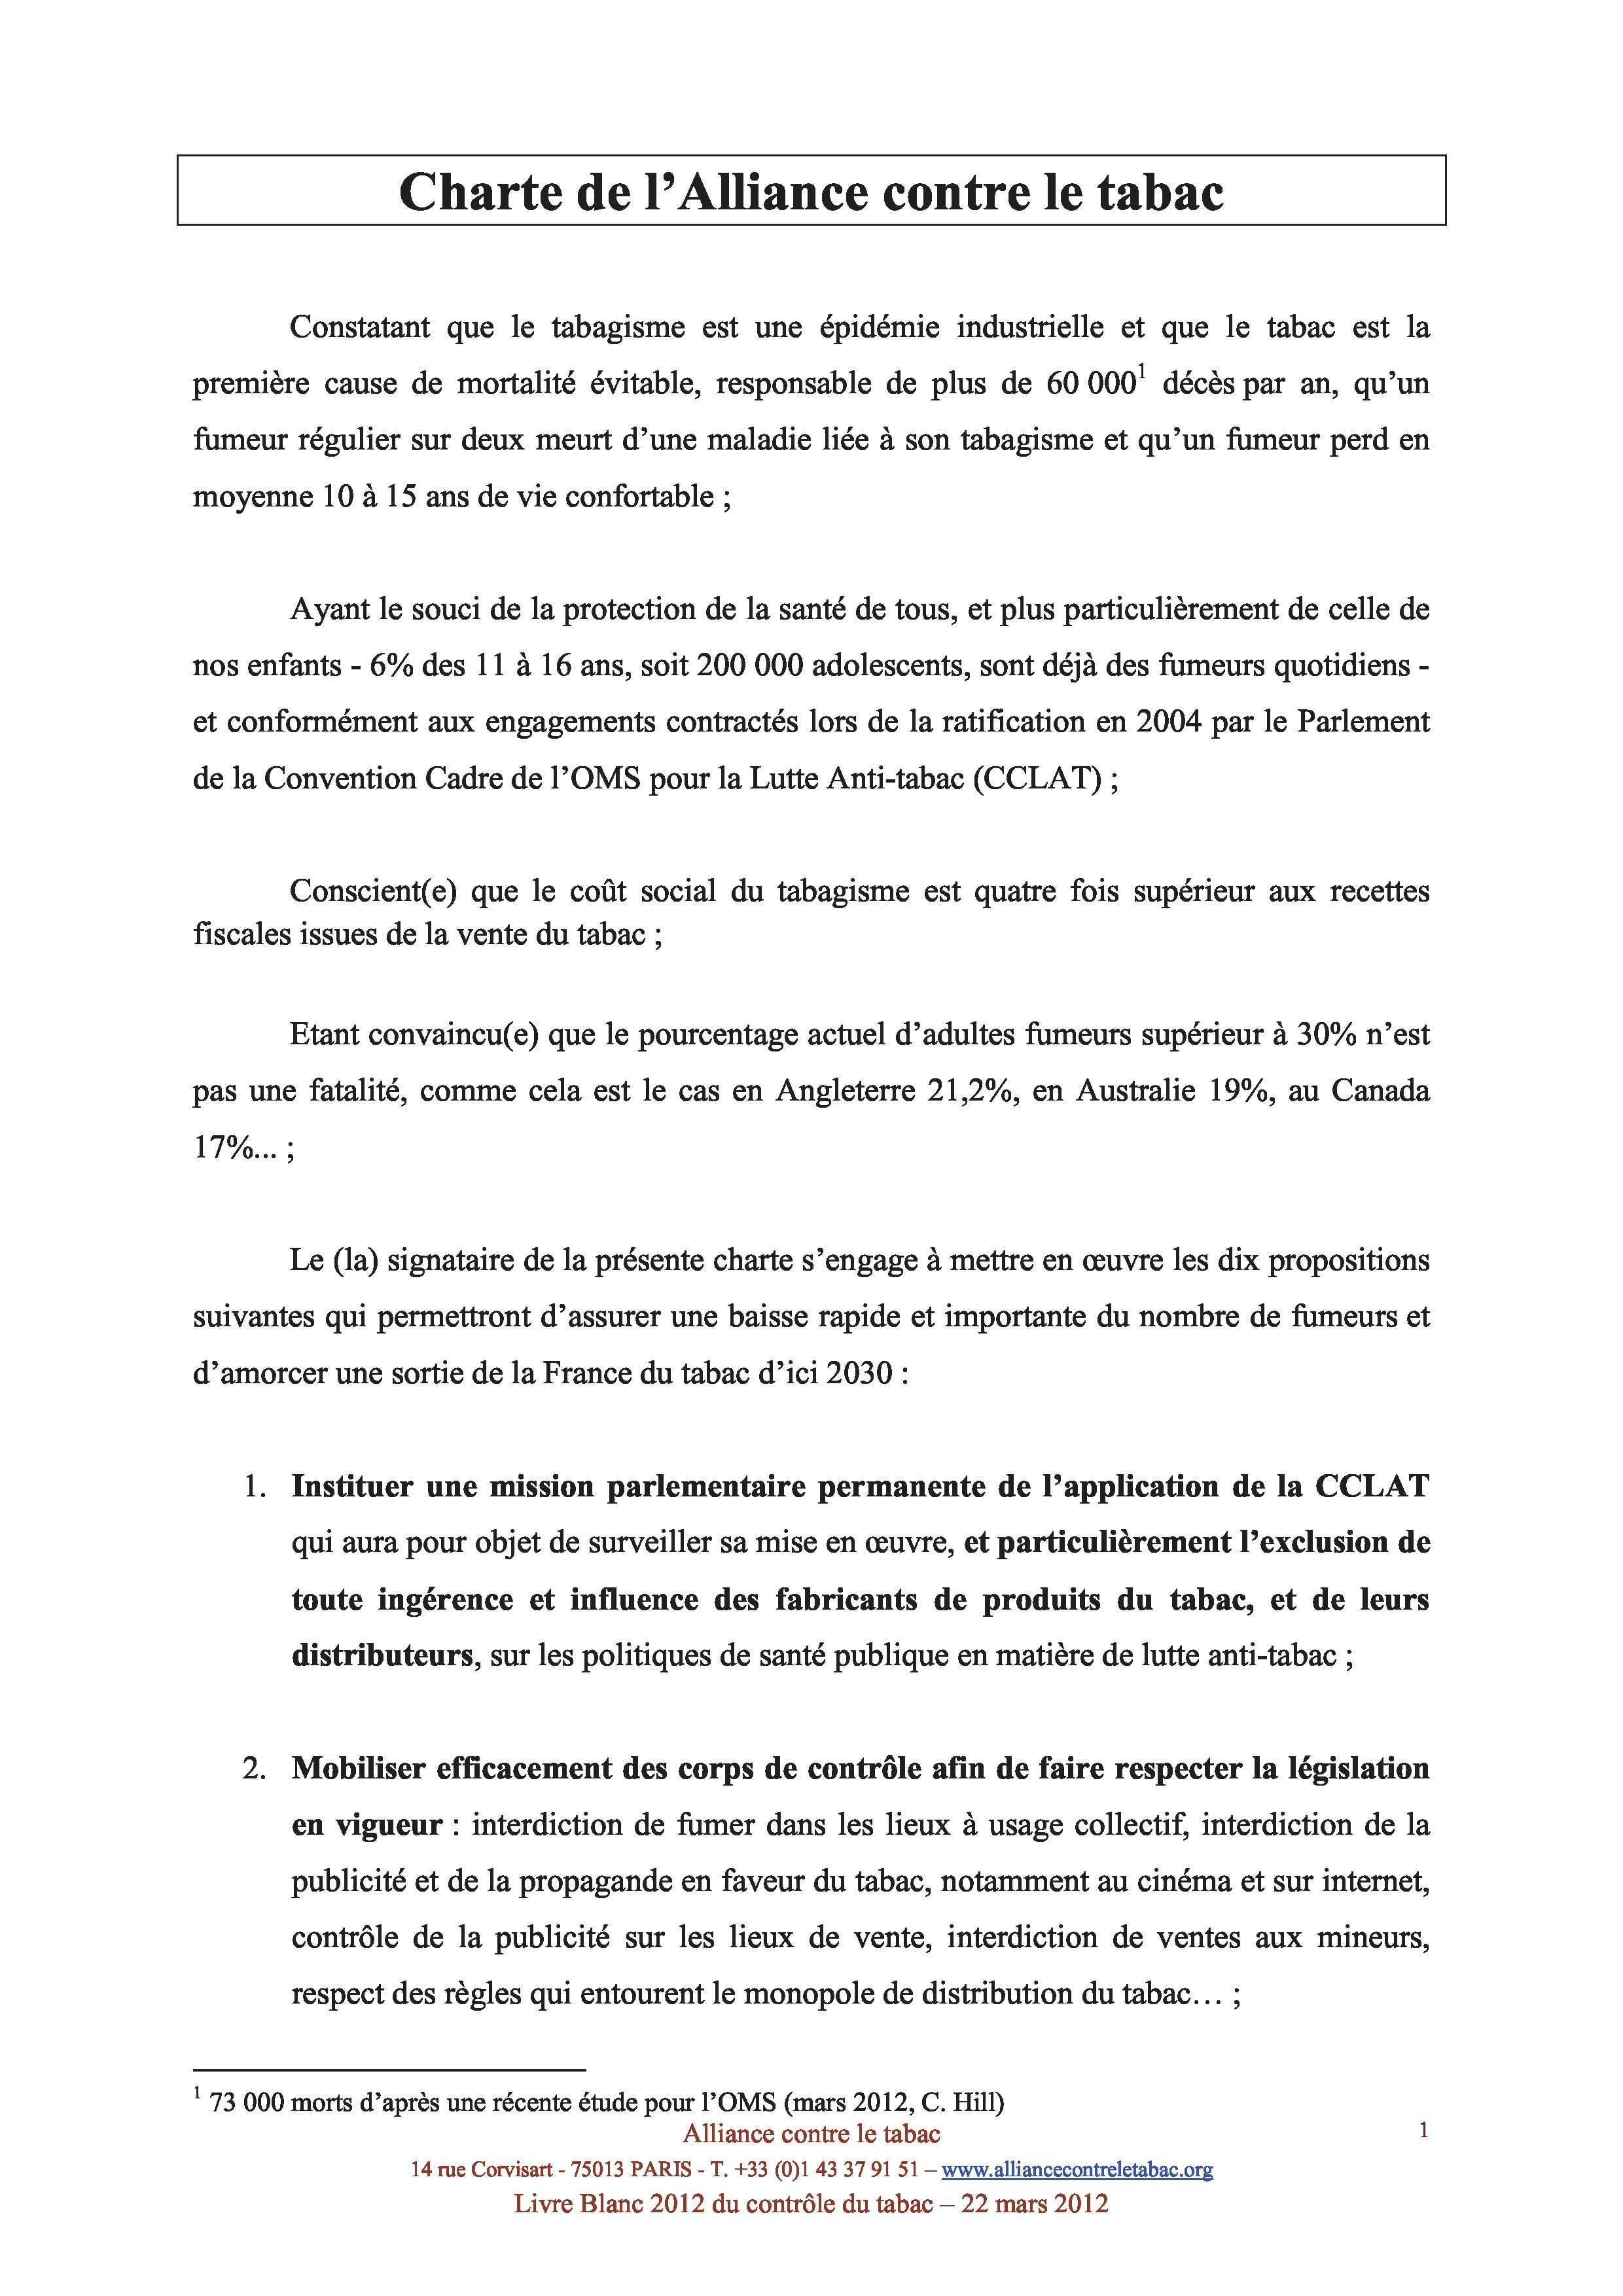 Alliance-dossier-presse-livre-blanc-11avr2012_Page_04.jpg